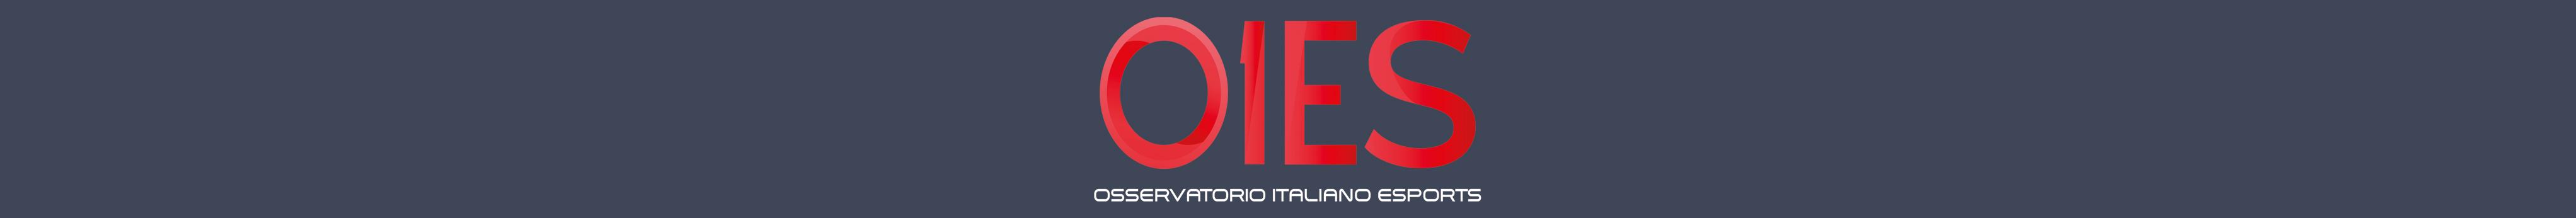 oies-banner